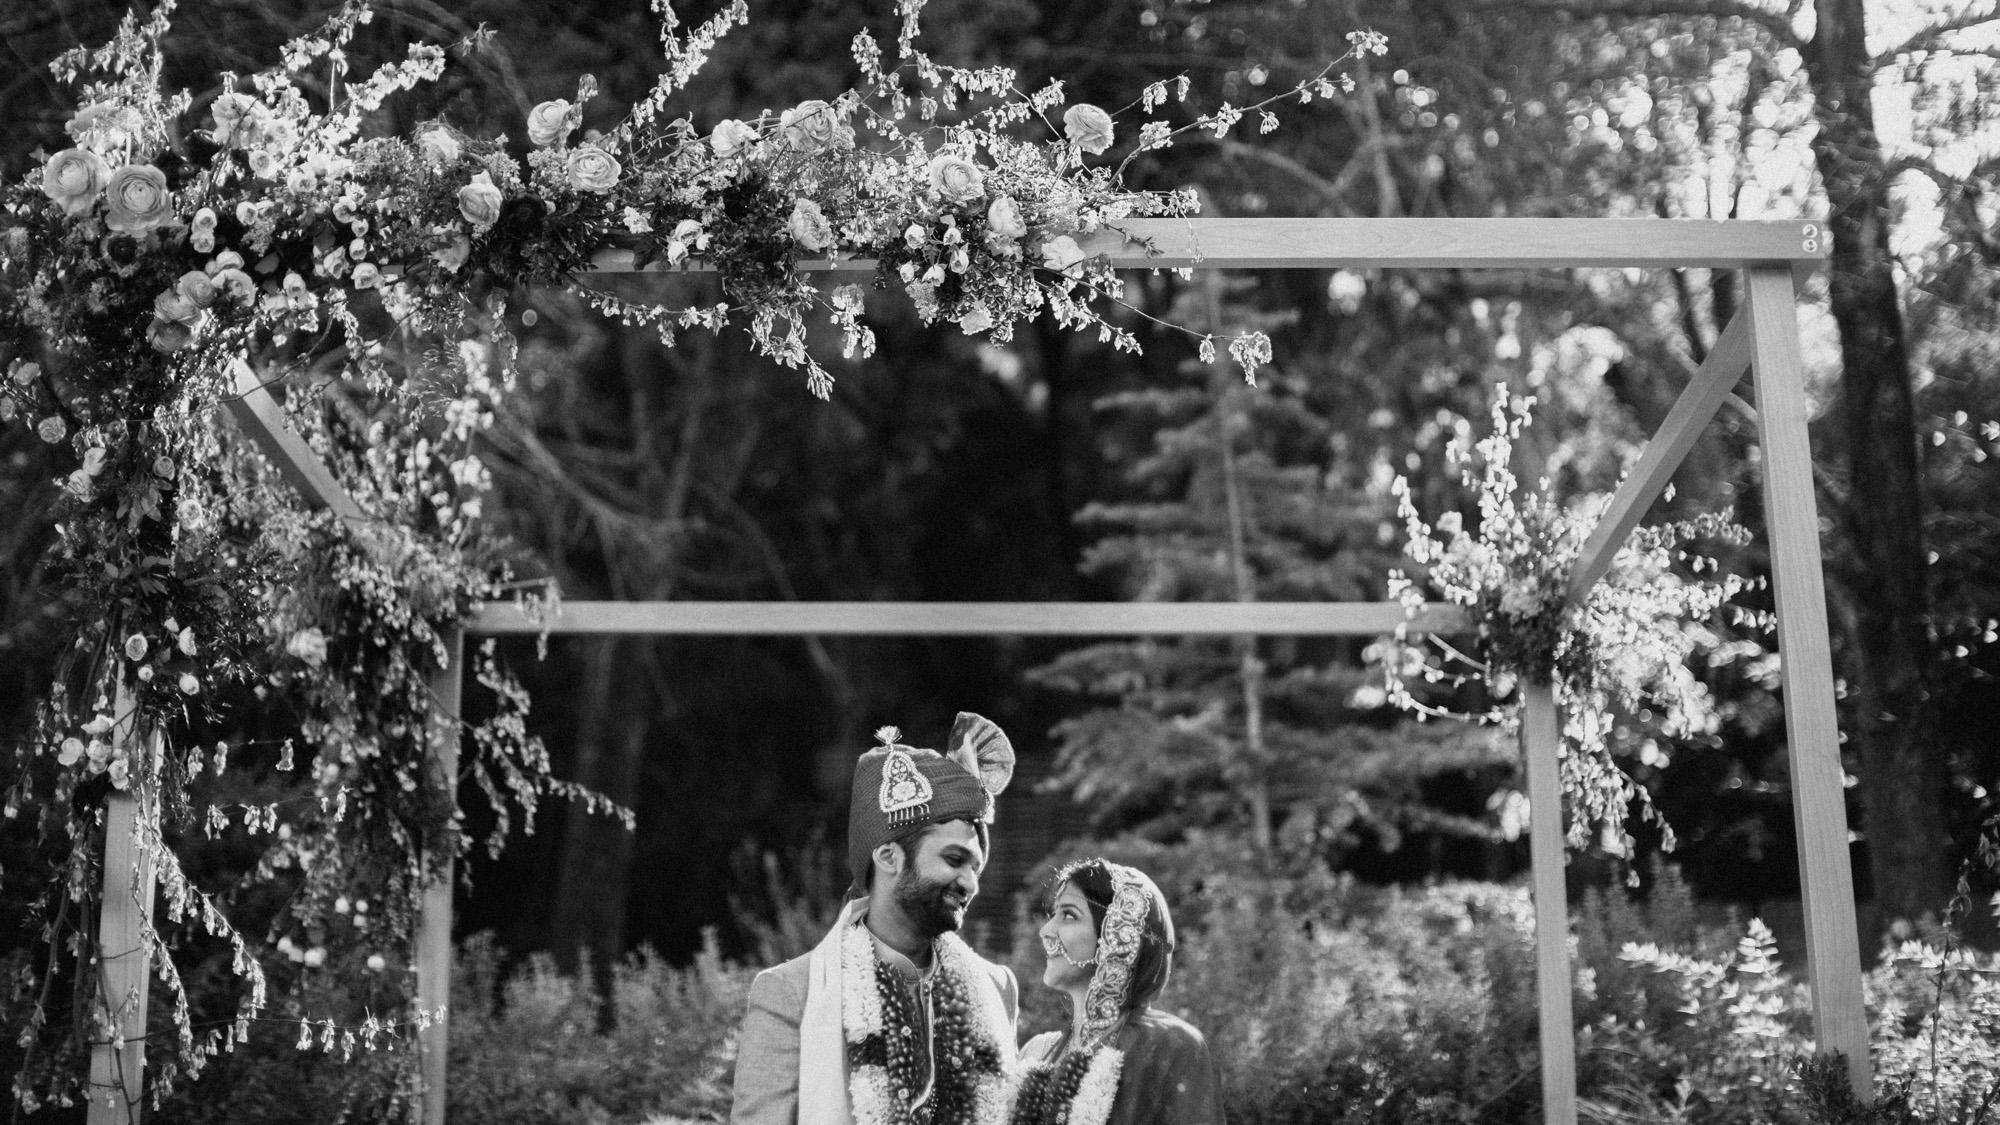 anu_maneesh_alec_vanderboom_Indian_wedding_photography-0117.jpg